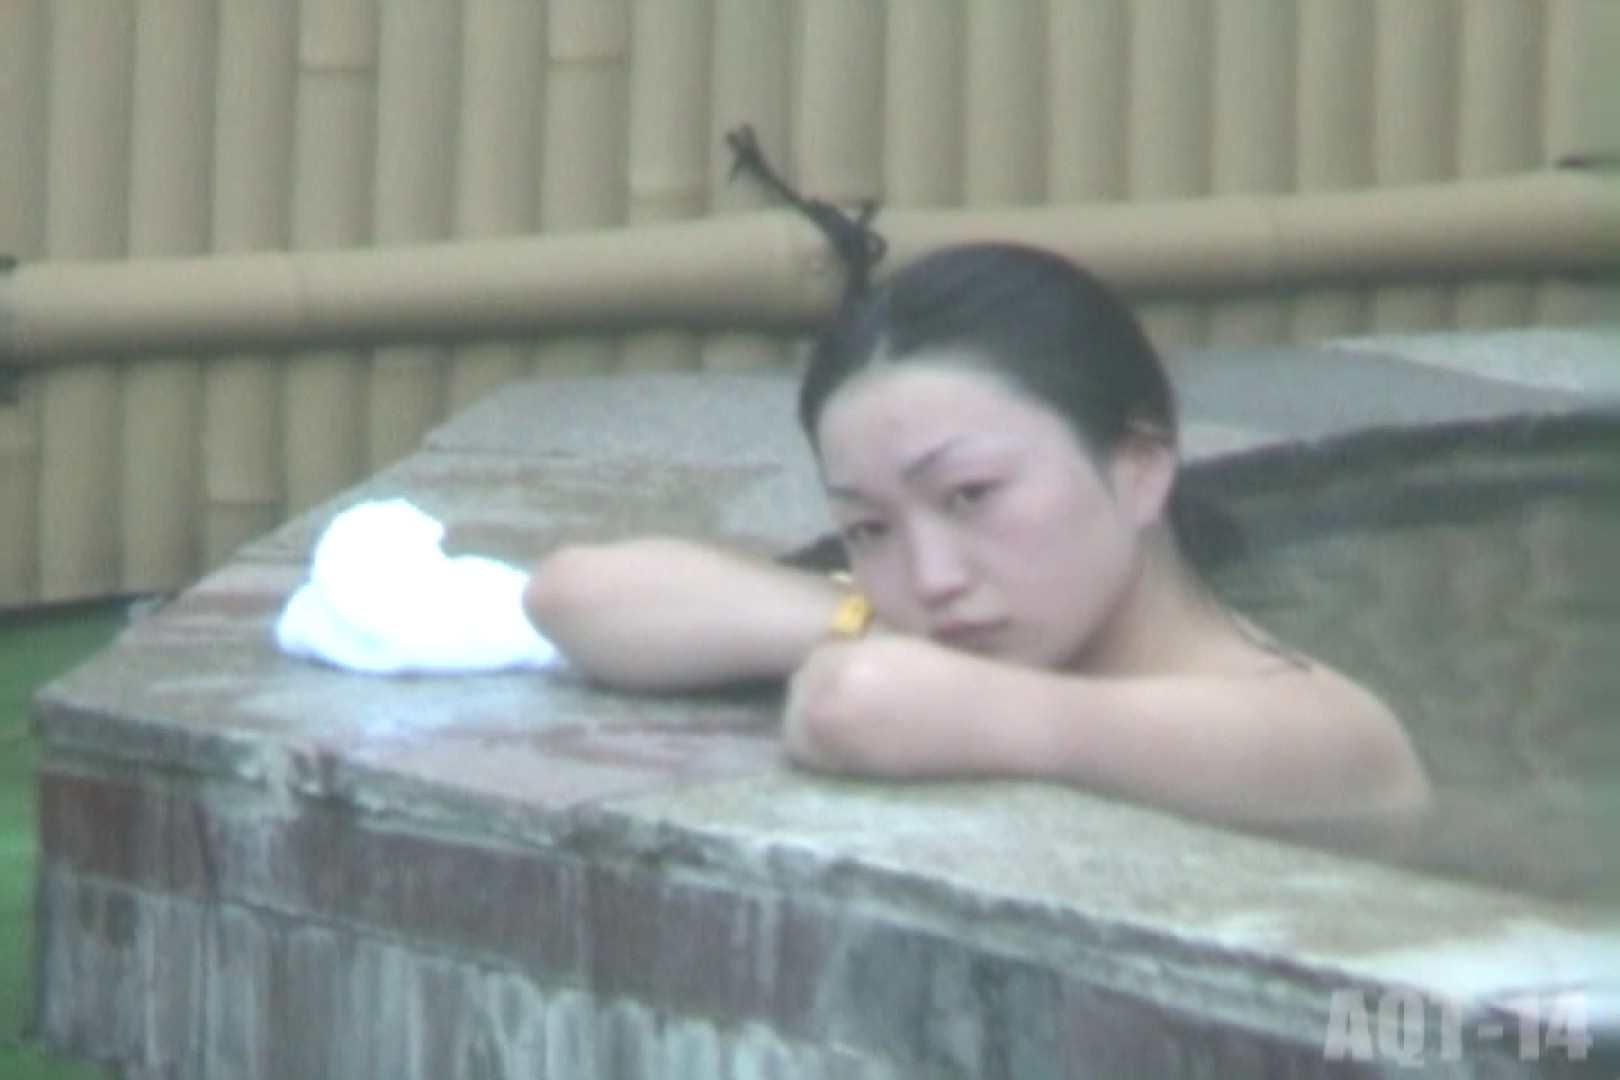 Aquaな露天風呂Vol.826 盗撮 | OLエロ画像  88PICs 67